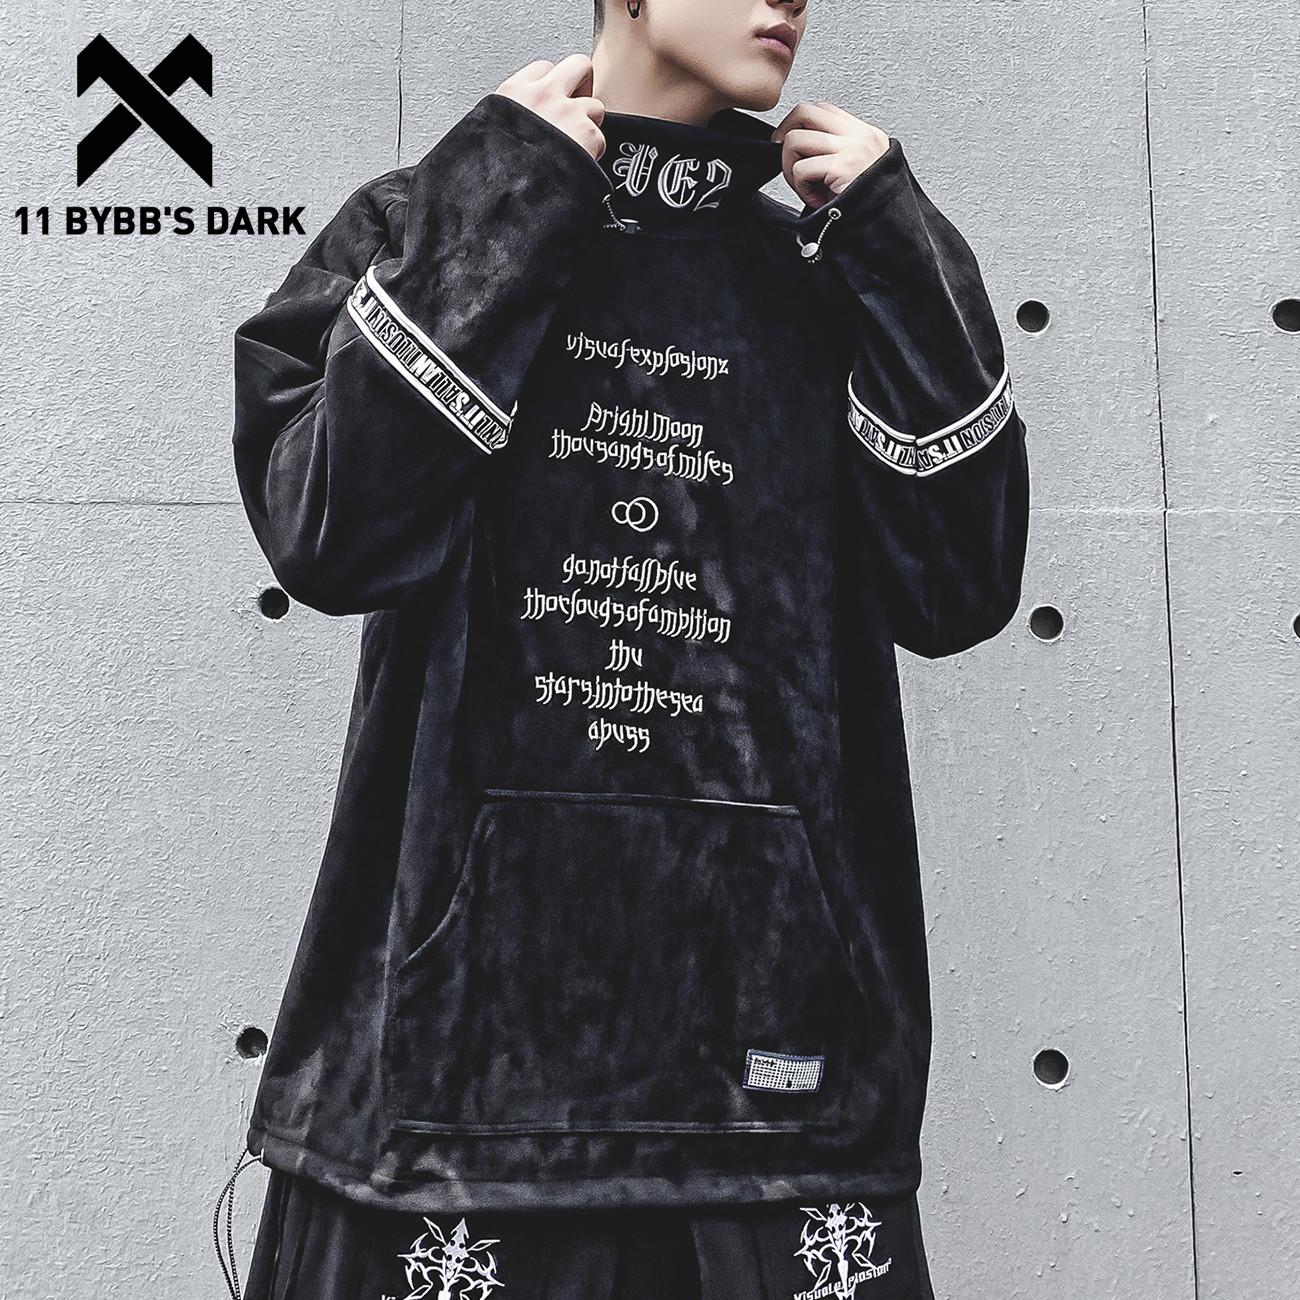 11 BYBB'S DARK Vintage Broderie Hip Hop Hoodie Techwear tactique Streetwear sweat à capuche pour hommes Streetwear Pull Coton 1019